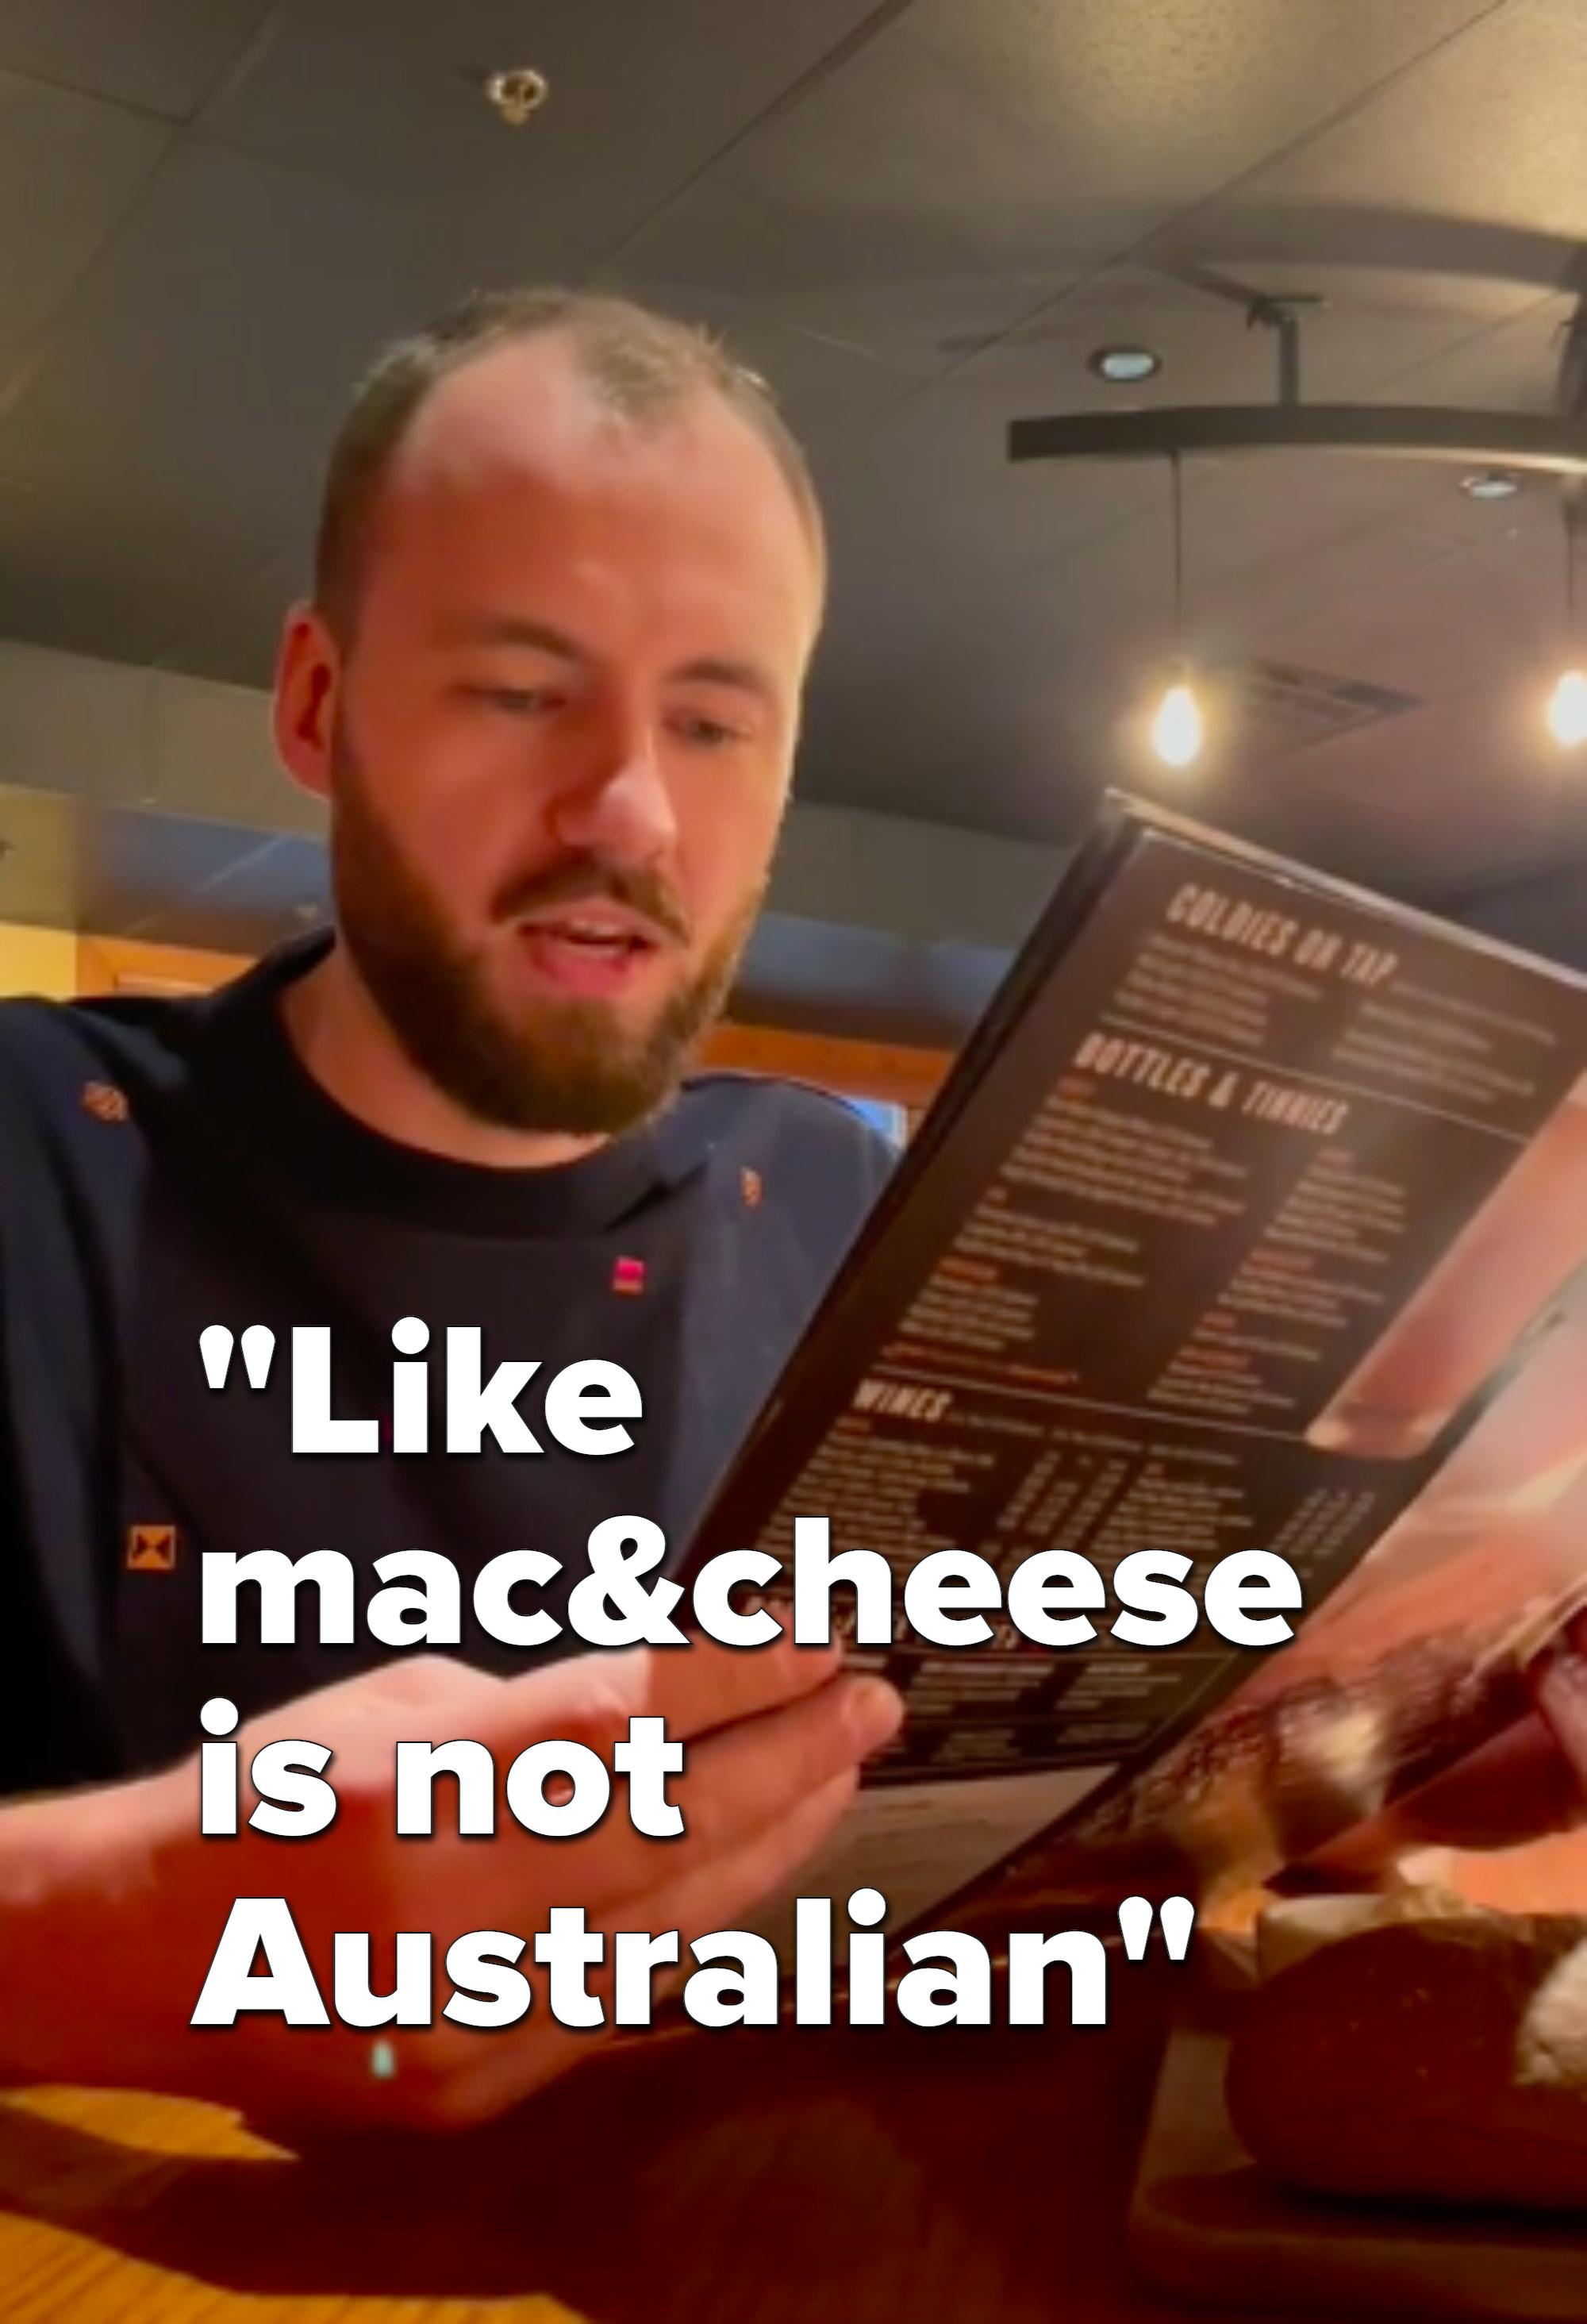 mac & cheese is not austarlian